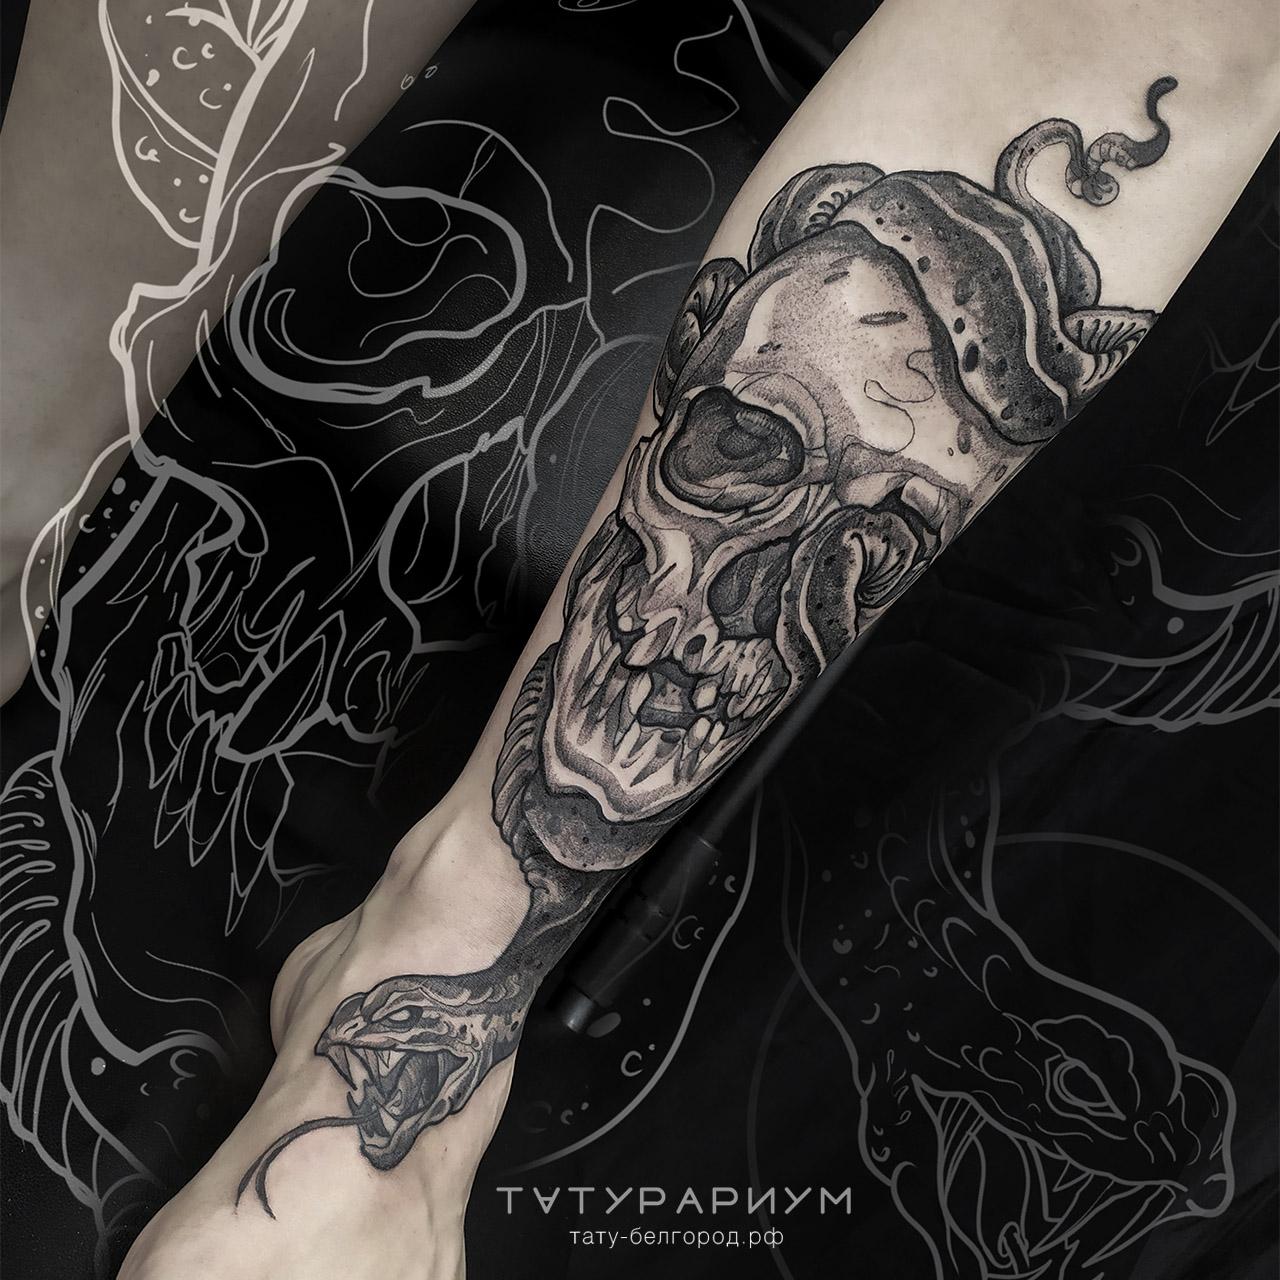 фото татуировки, череп со змеёй на голен